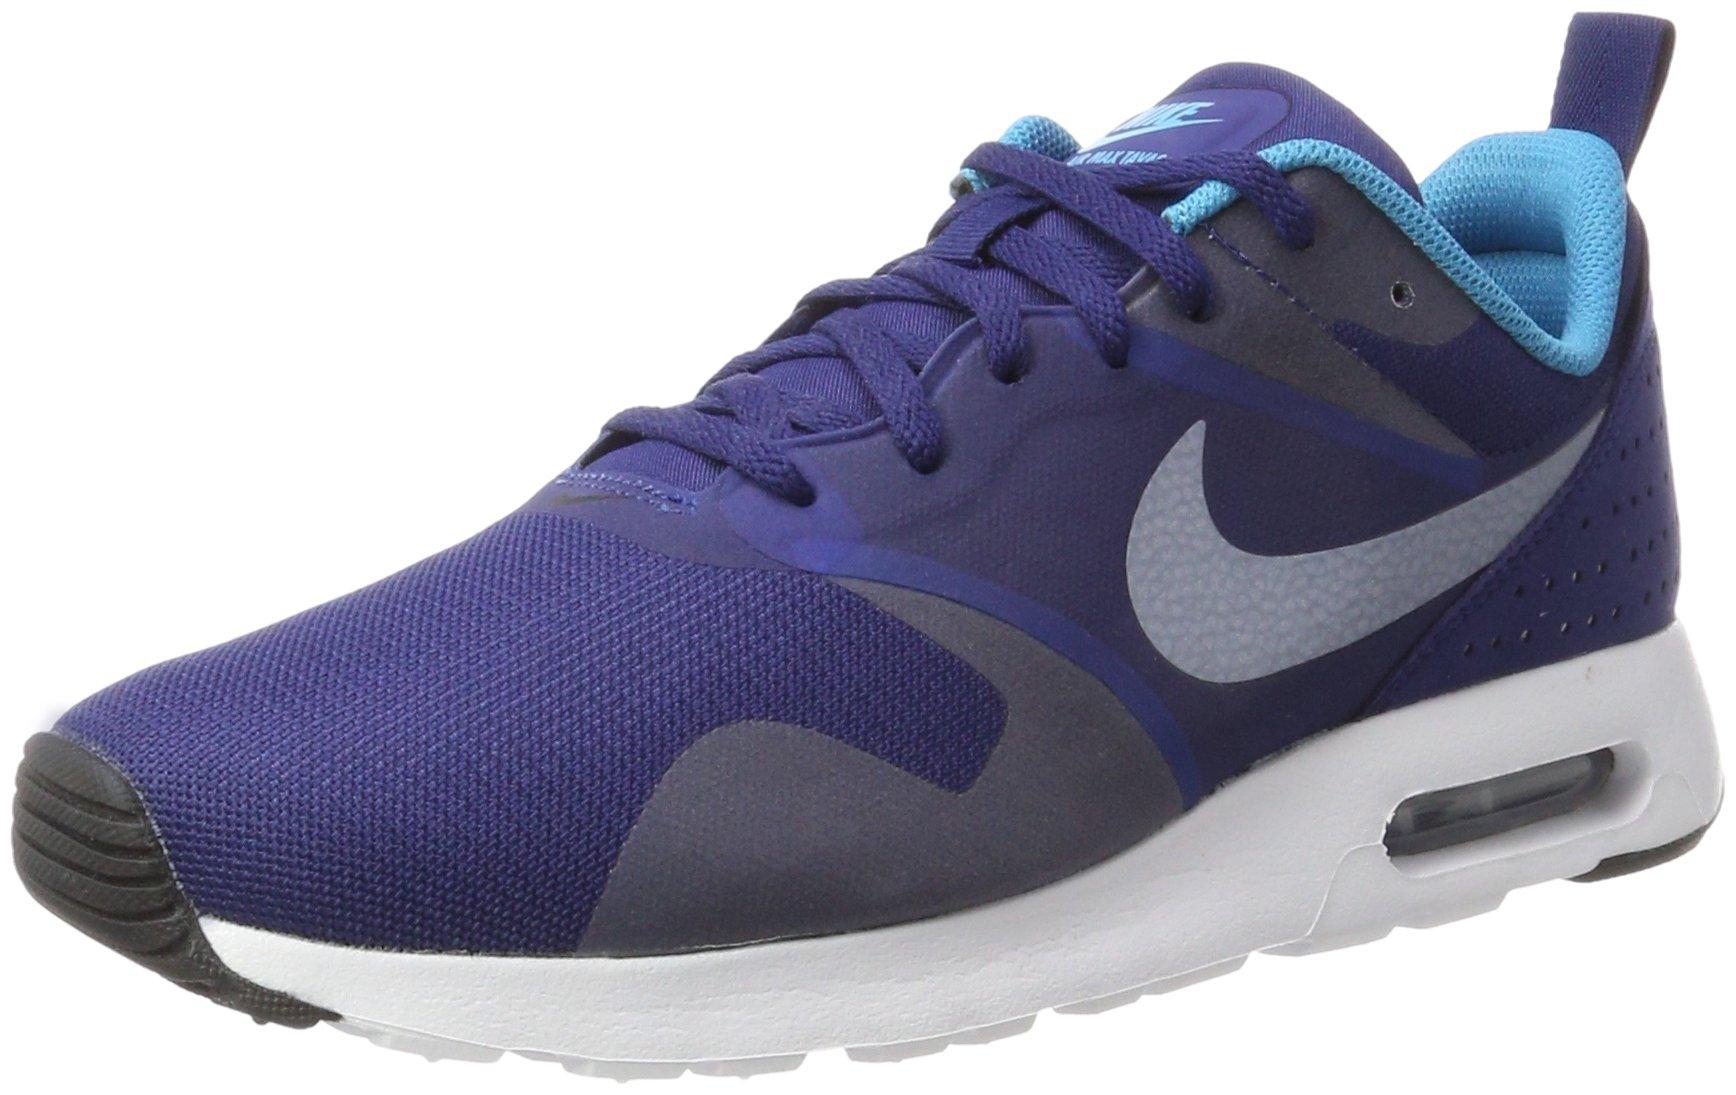 best sneakers 8277c 33c1e Galleon - Nike Men s Air Max Tavas Loyal Blue White Blue Lagoon Black Shoes  - 9 D(M) US